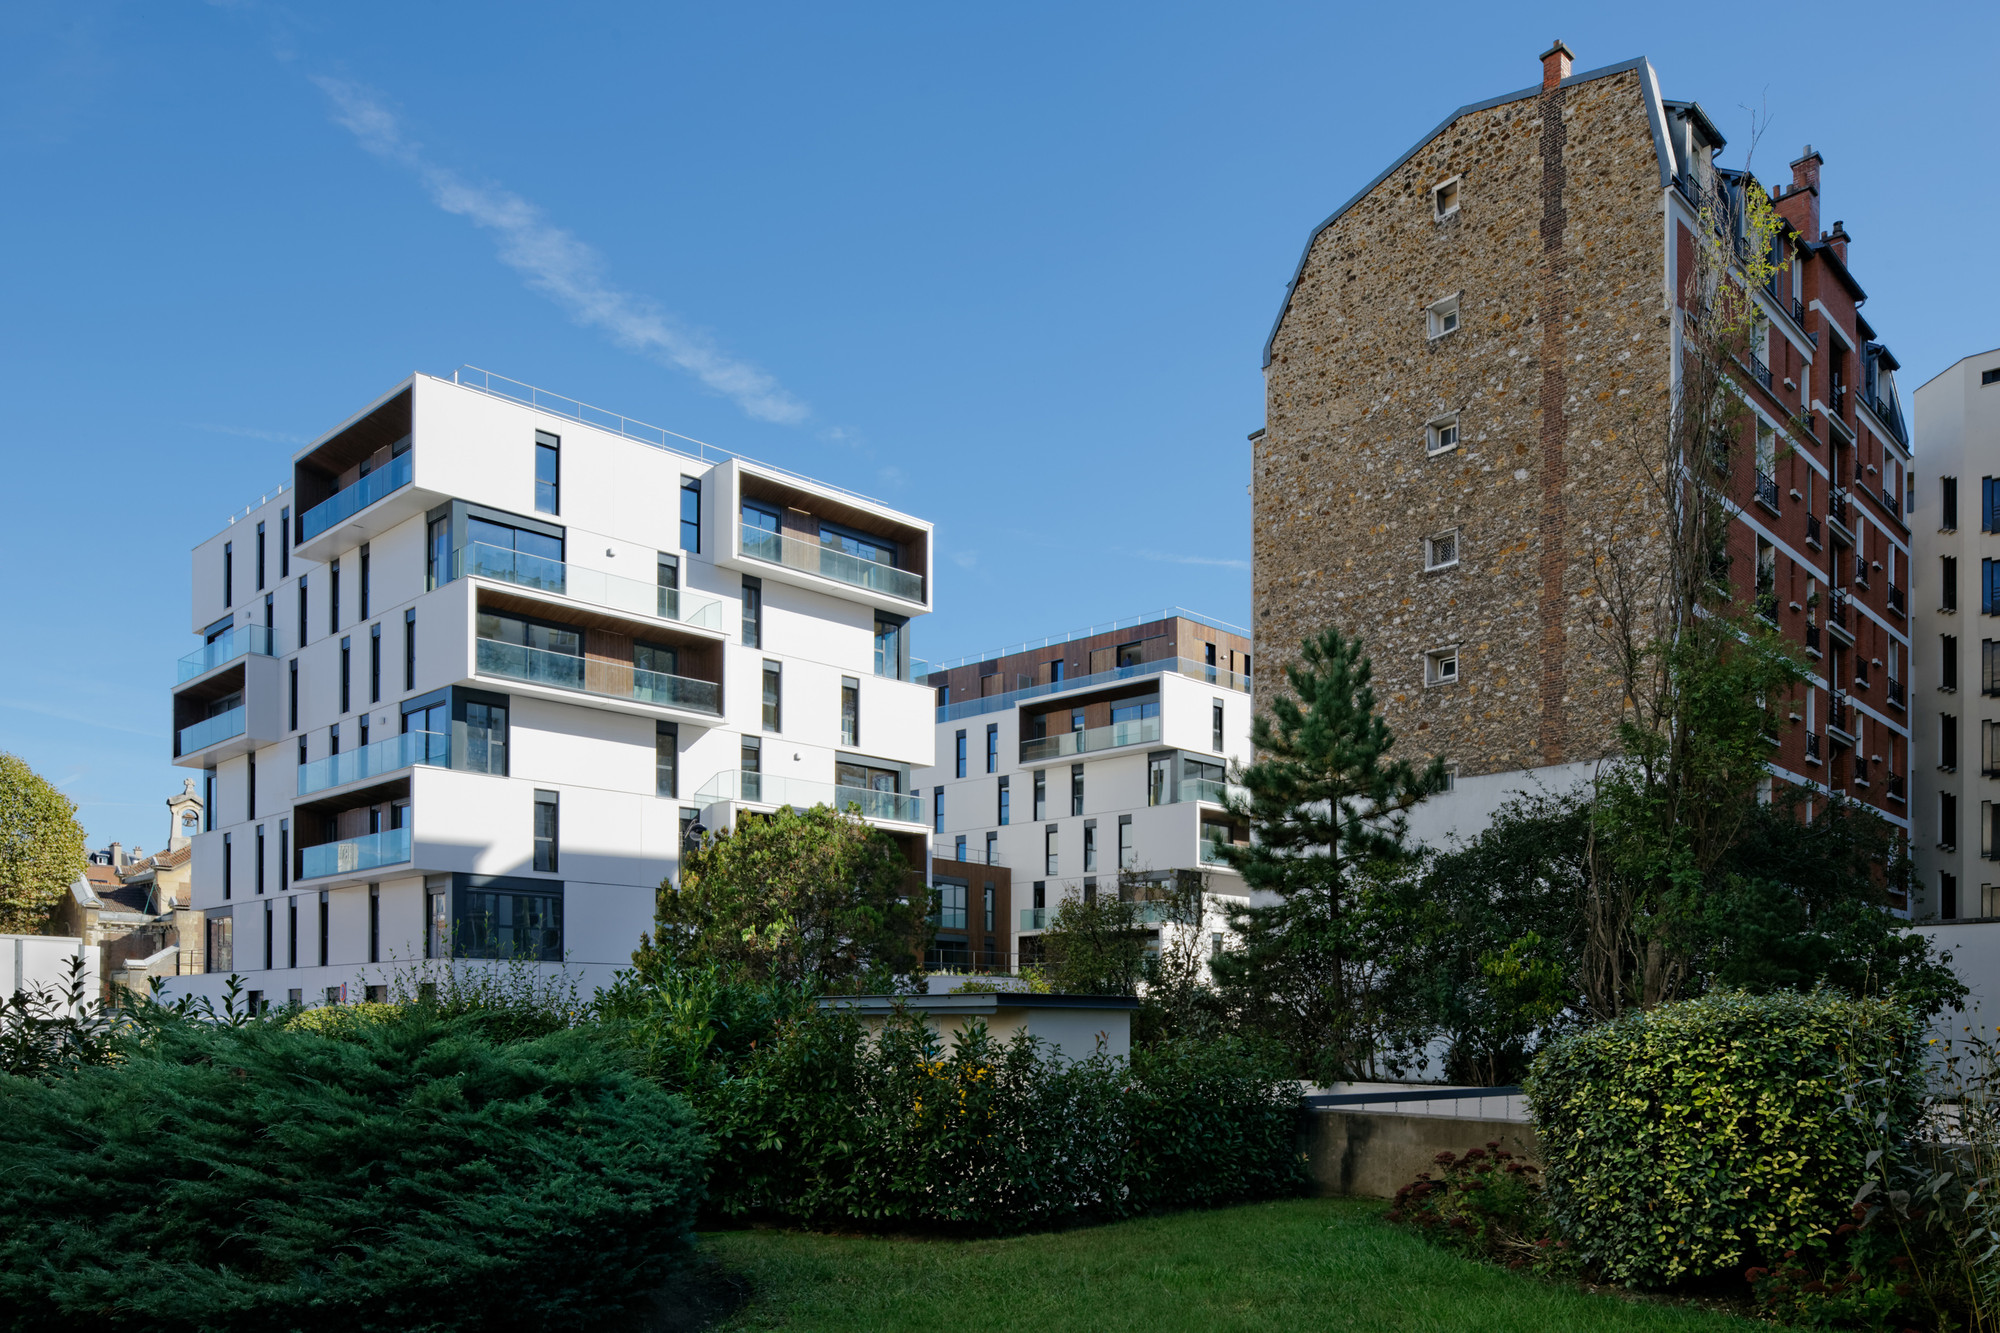 Zac Boucicaut In Paris / Ameller, Dubois & Associés  Architectes, © Takuji Shimmura